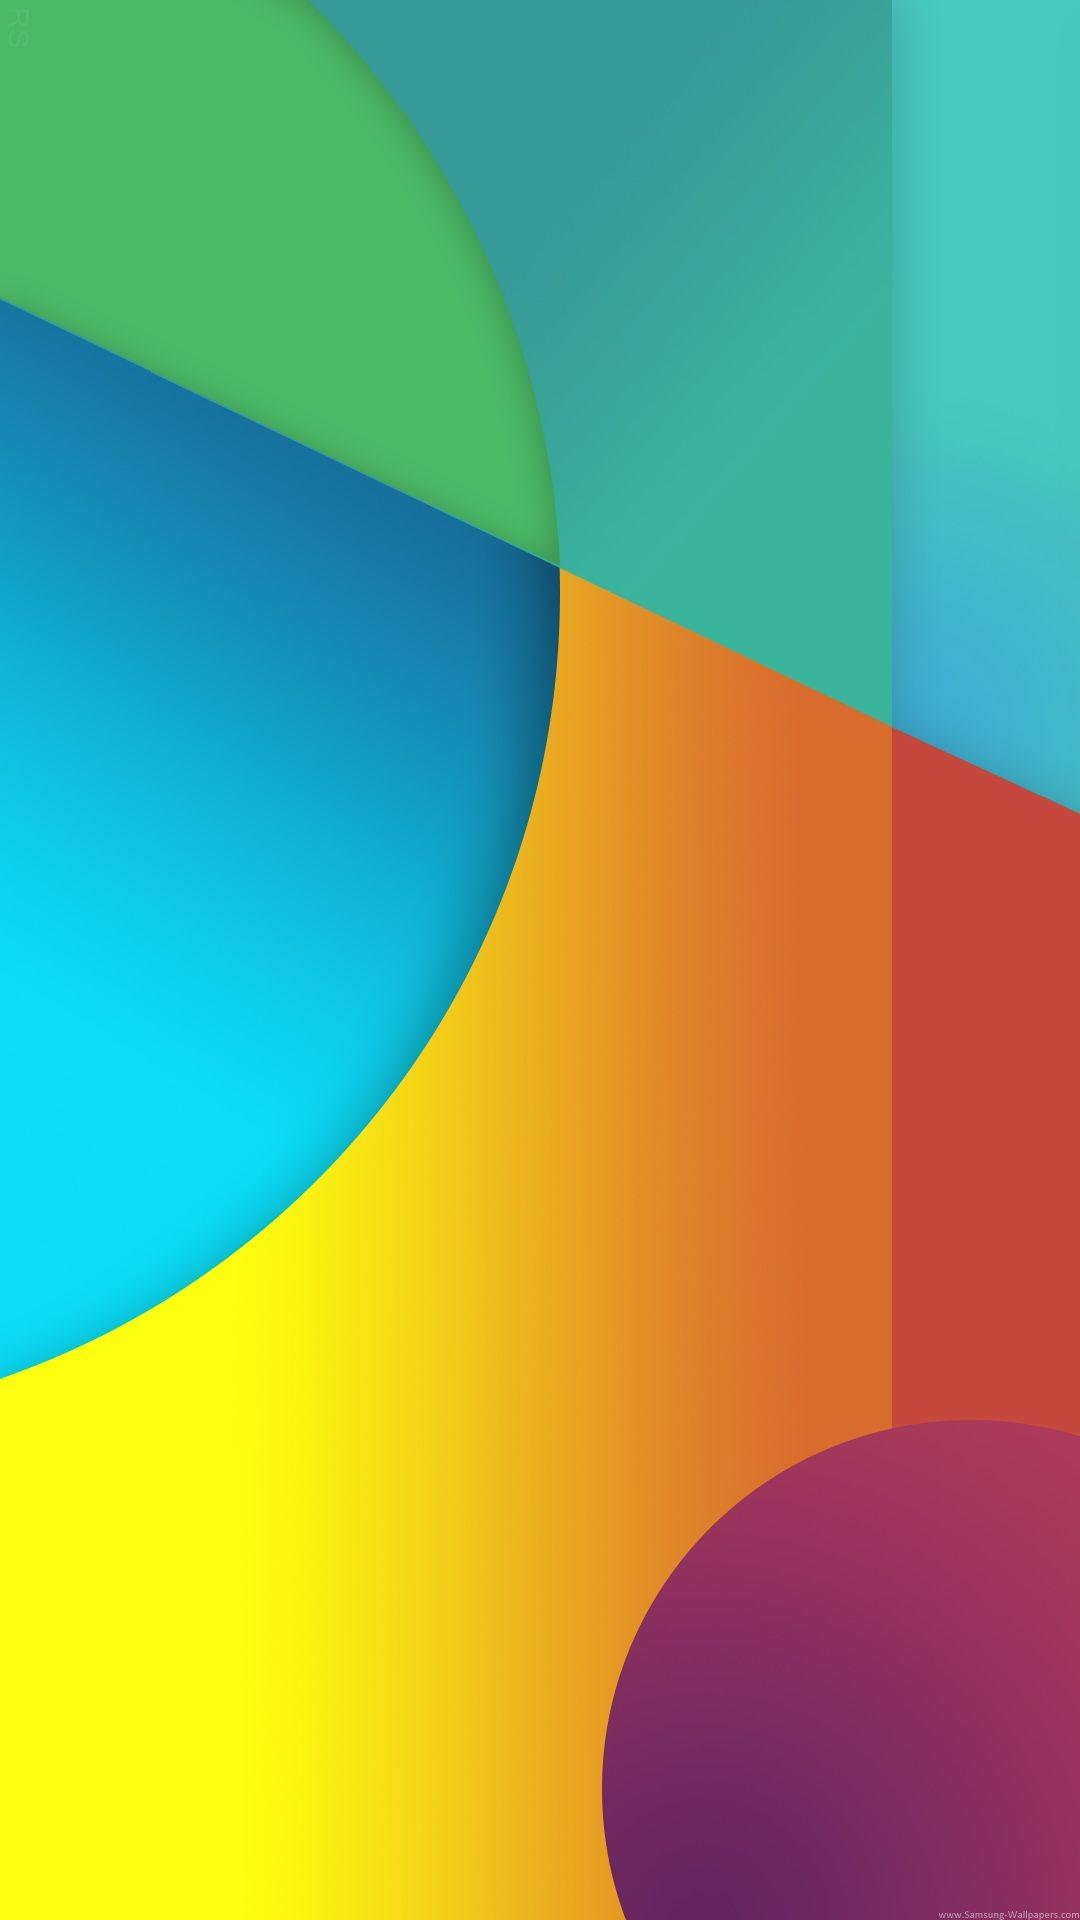 2975x1920 Wallpaperwiki Nexus 7 Wallpaper HD Free Download